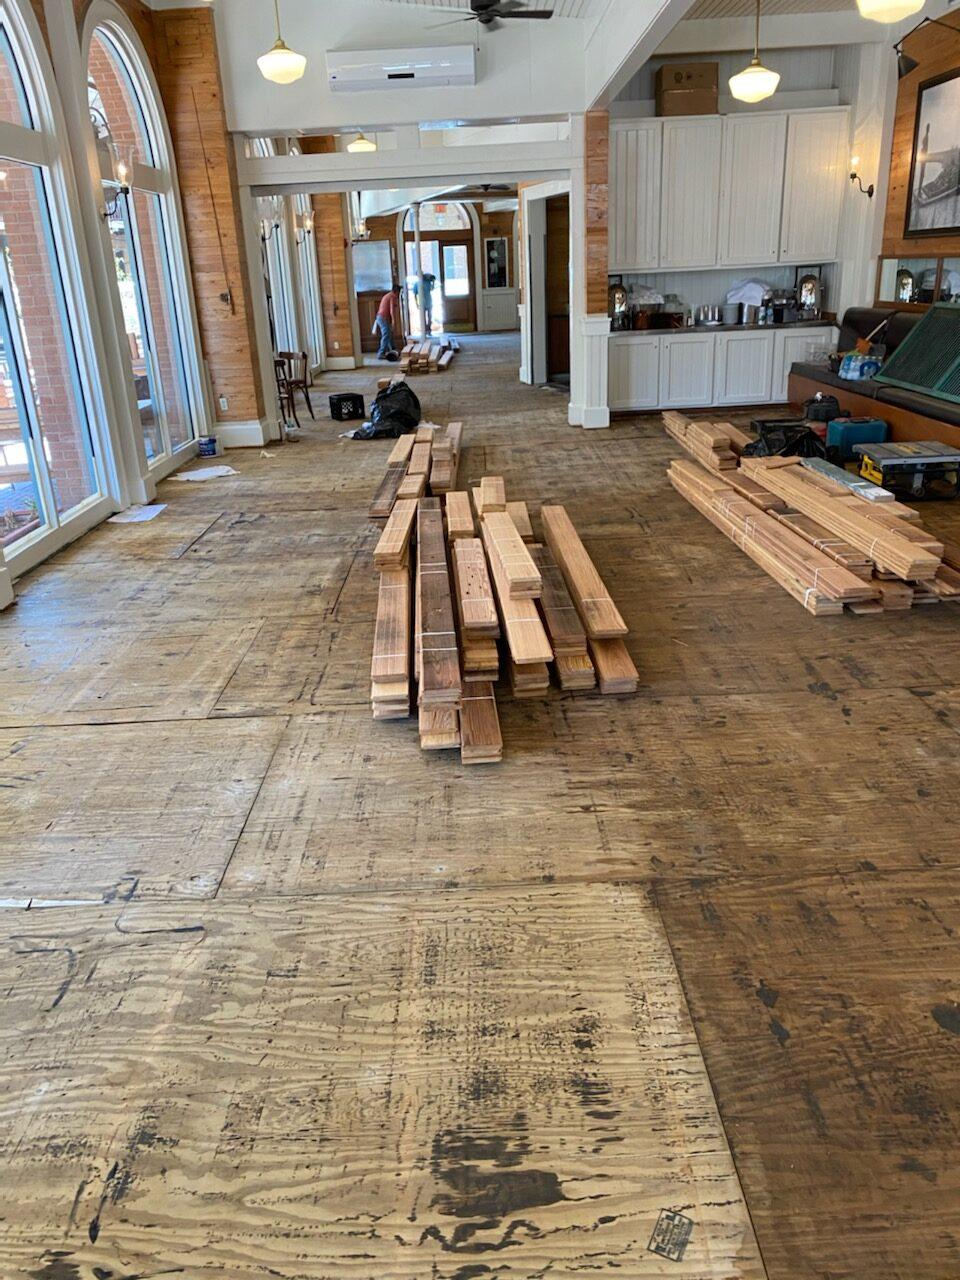 Photo of demoed wood flooring in a restaurant.